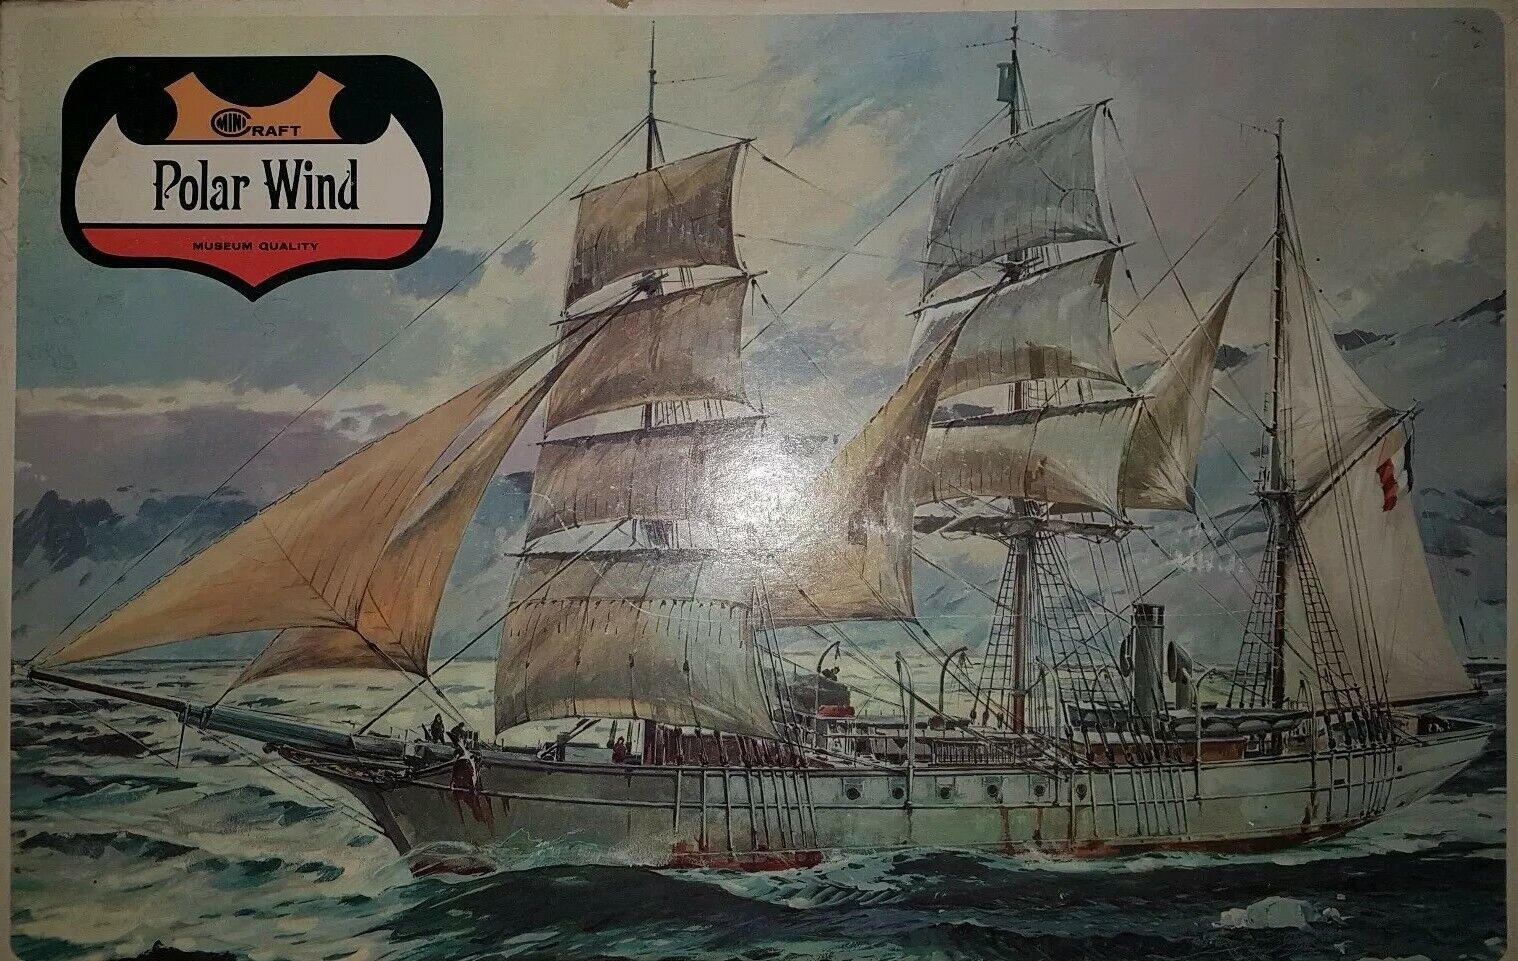 Image 01 - Minicraft-Polar-Wind-Pourquoi-pas-144-800-ex-Heller-Sail-Steam-Antarctic-Ship